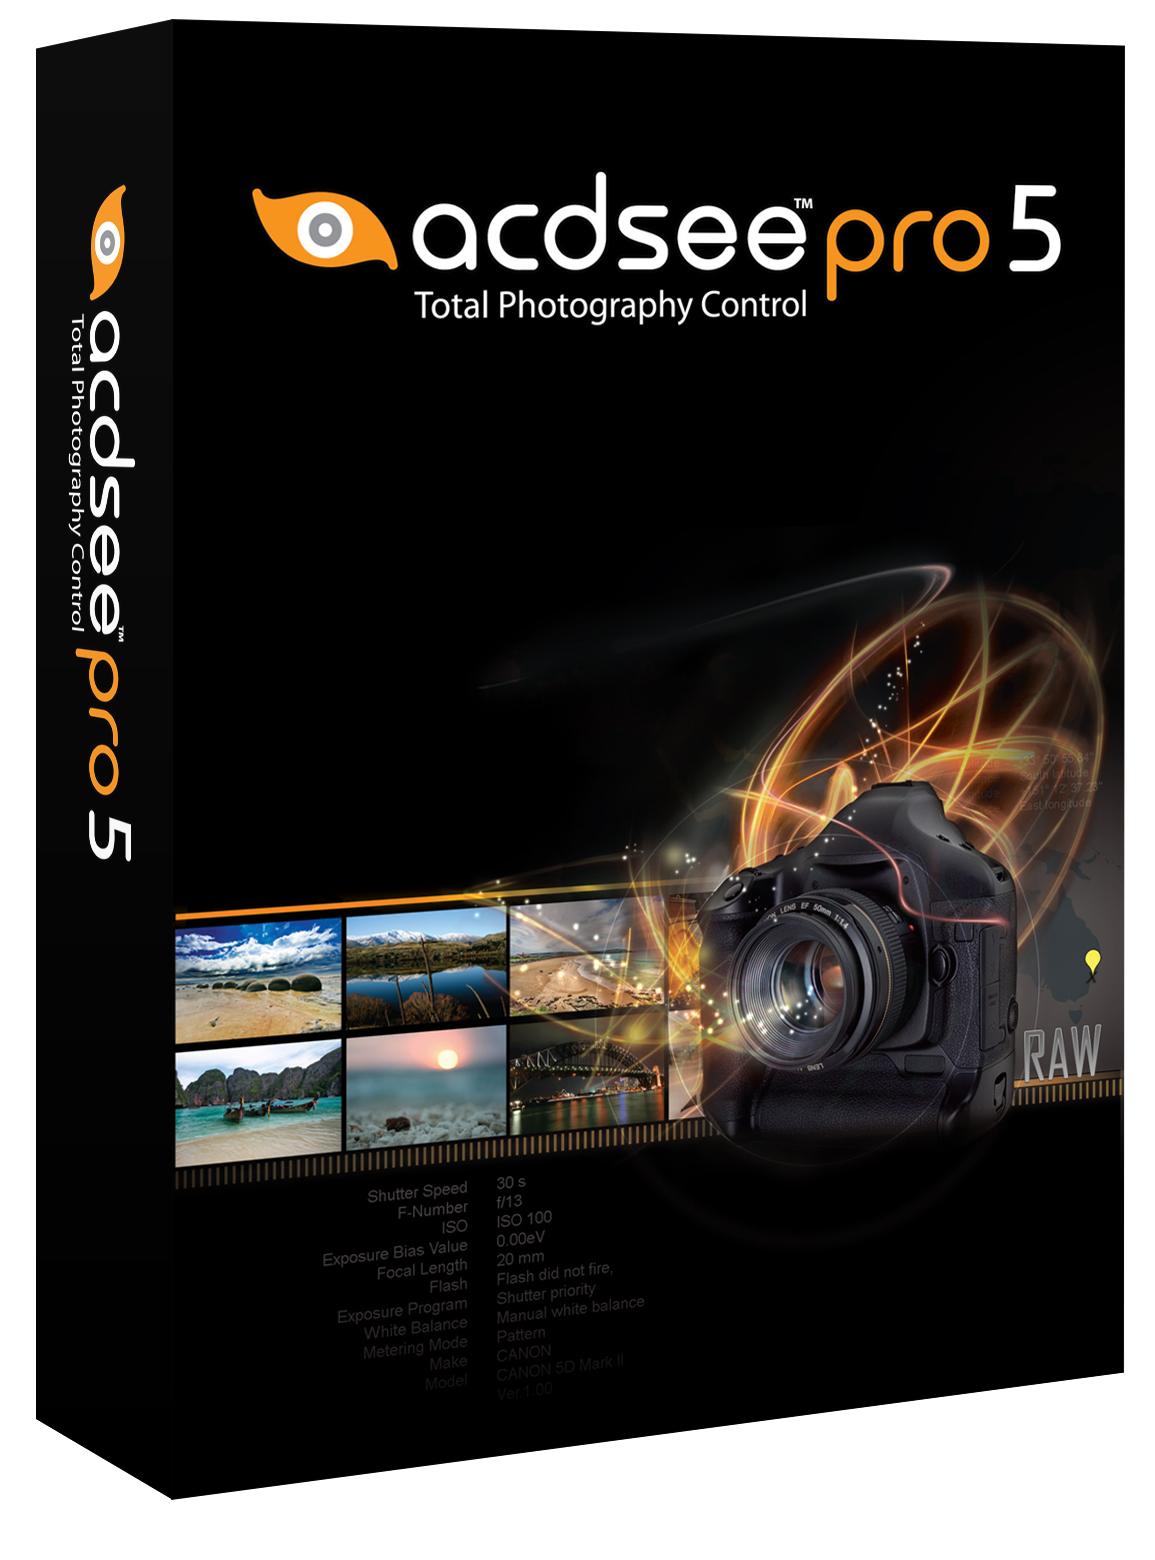 ACDSee Pro v5.2 Build 157 Portable (от 19 апреля 2012) .